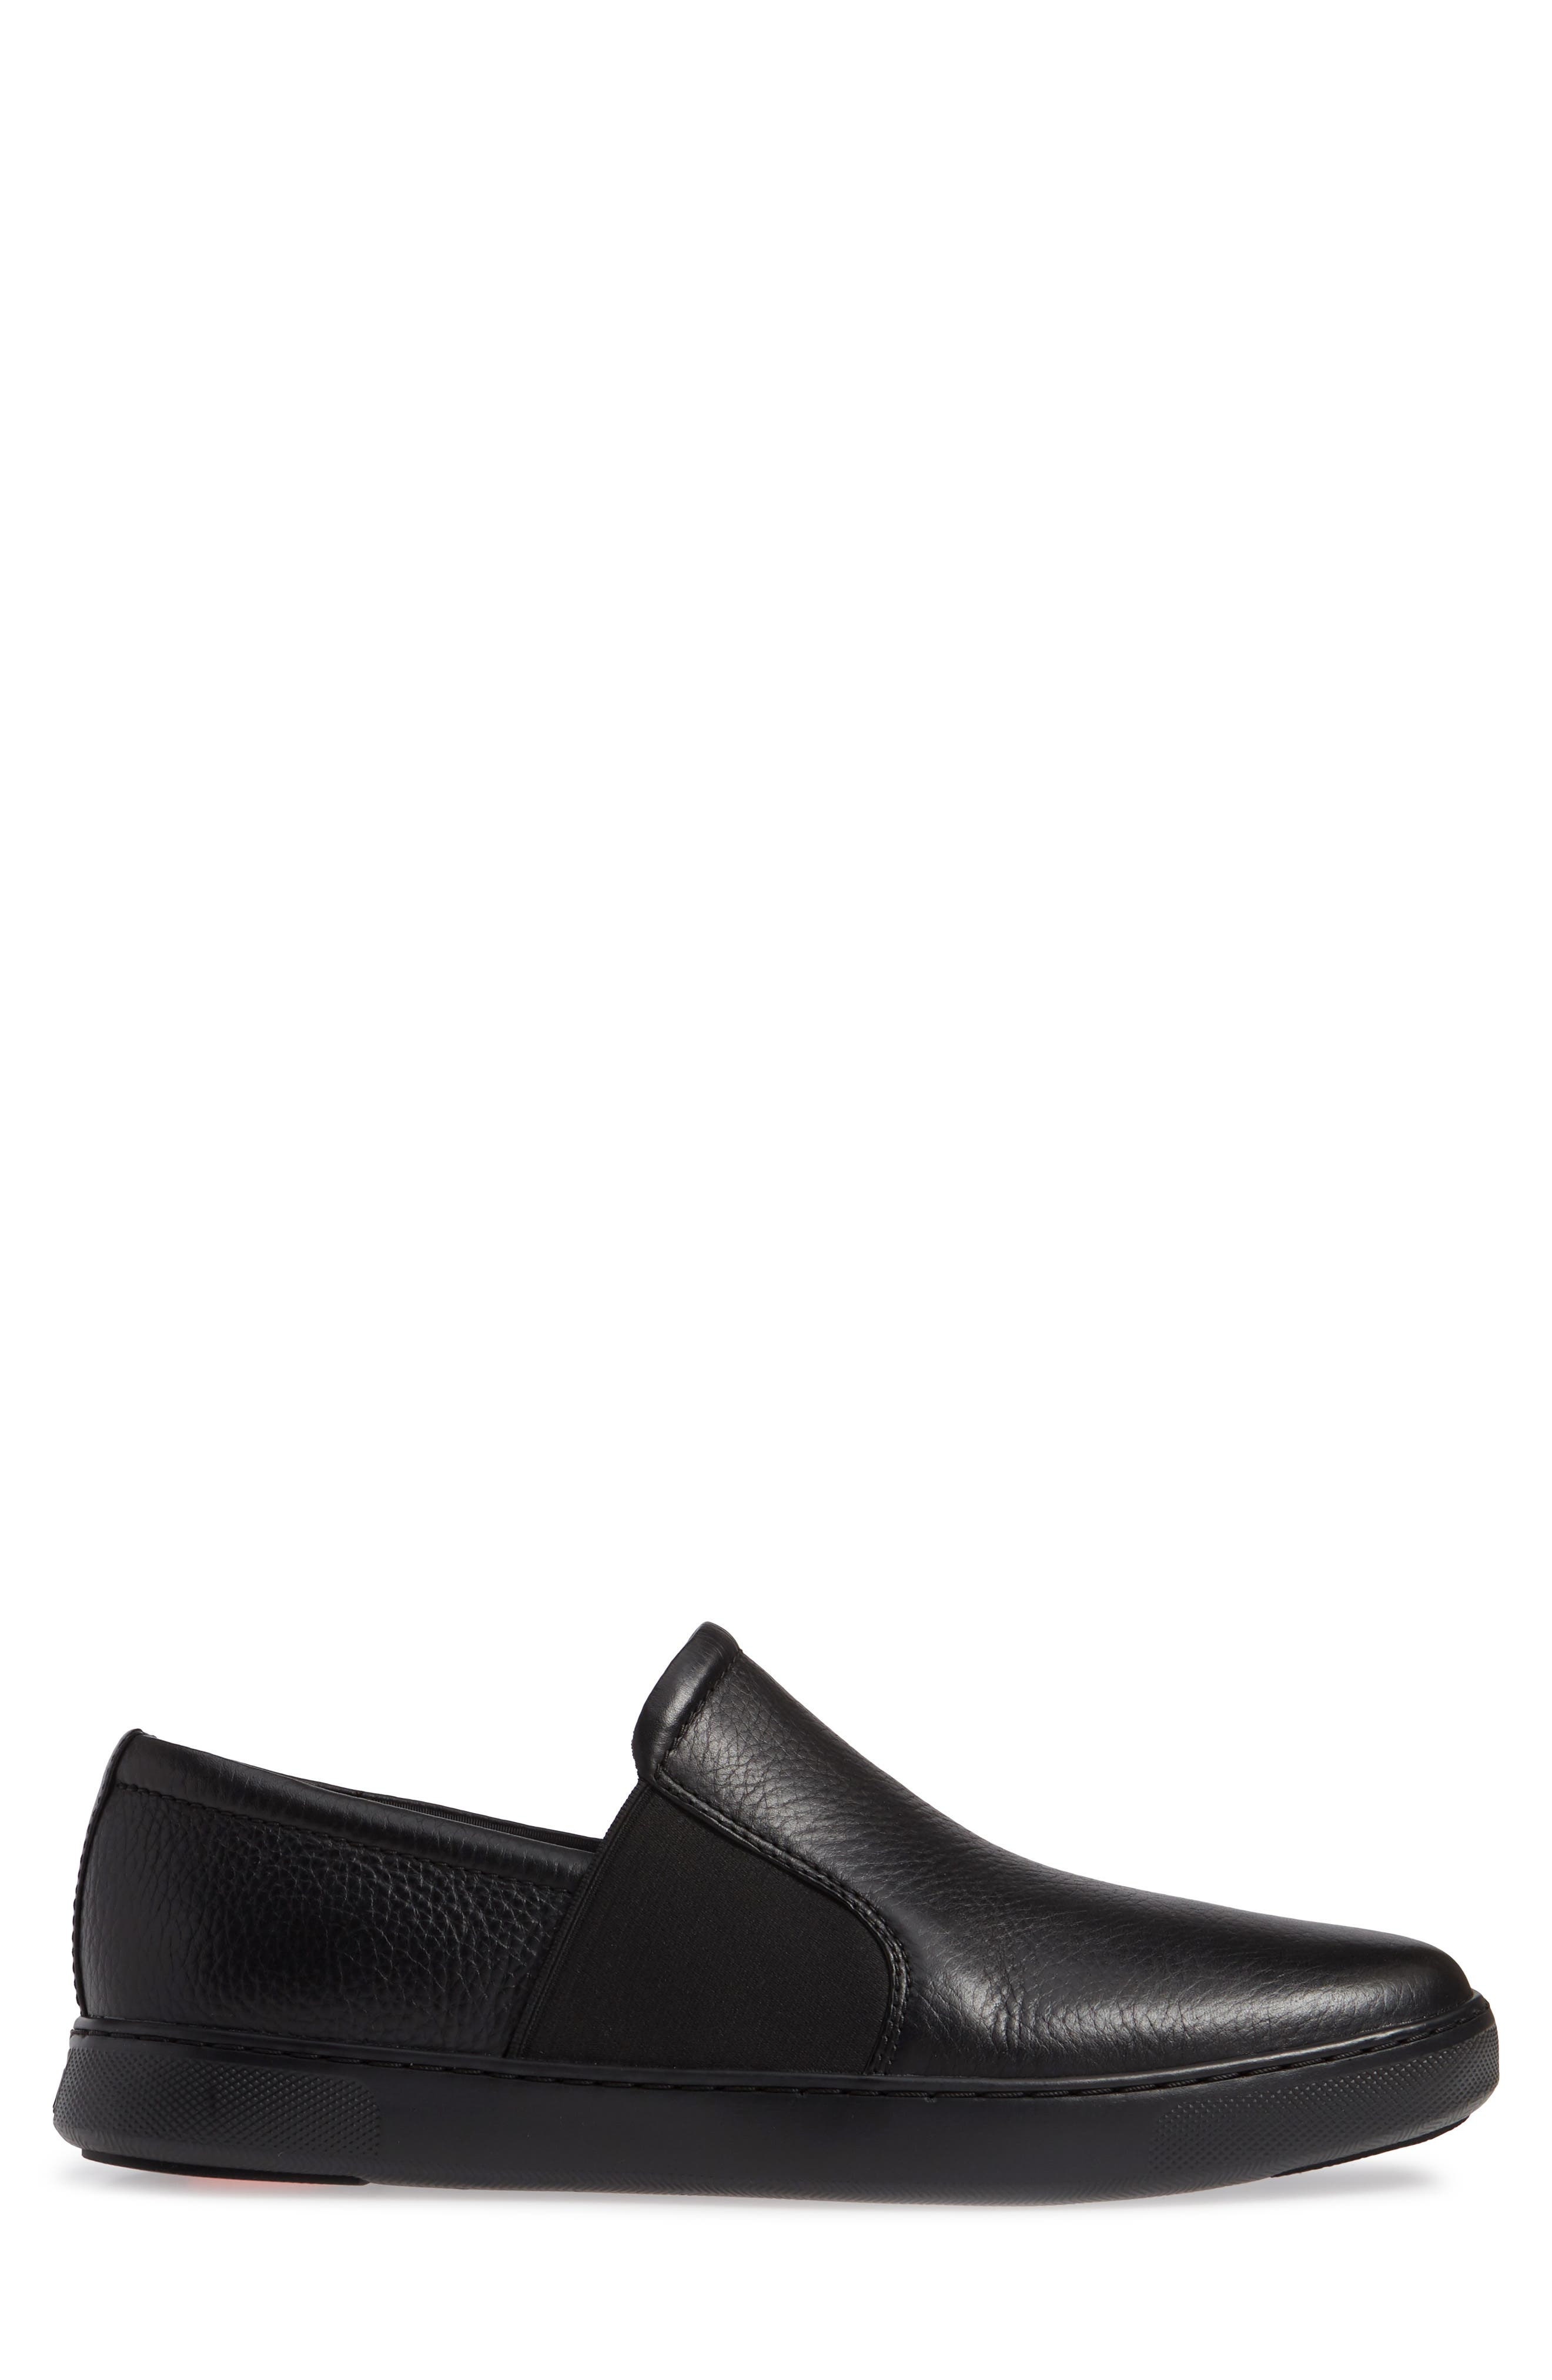 FITFLOP,                             Collins Slip-On Sneaker,                             Alternate thumbnail 3, color,                             BLACK